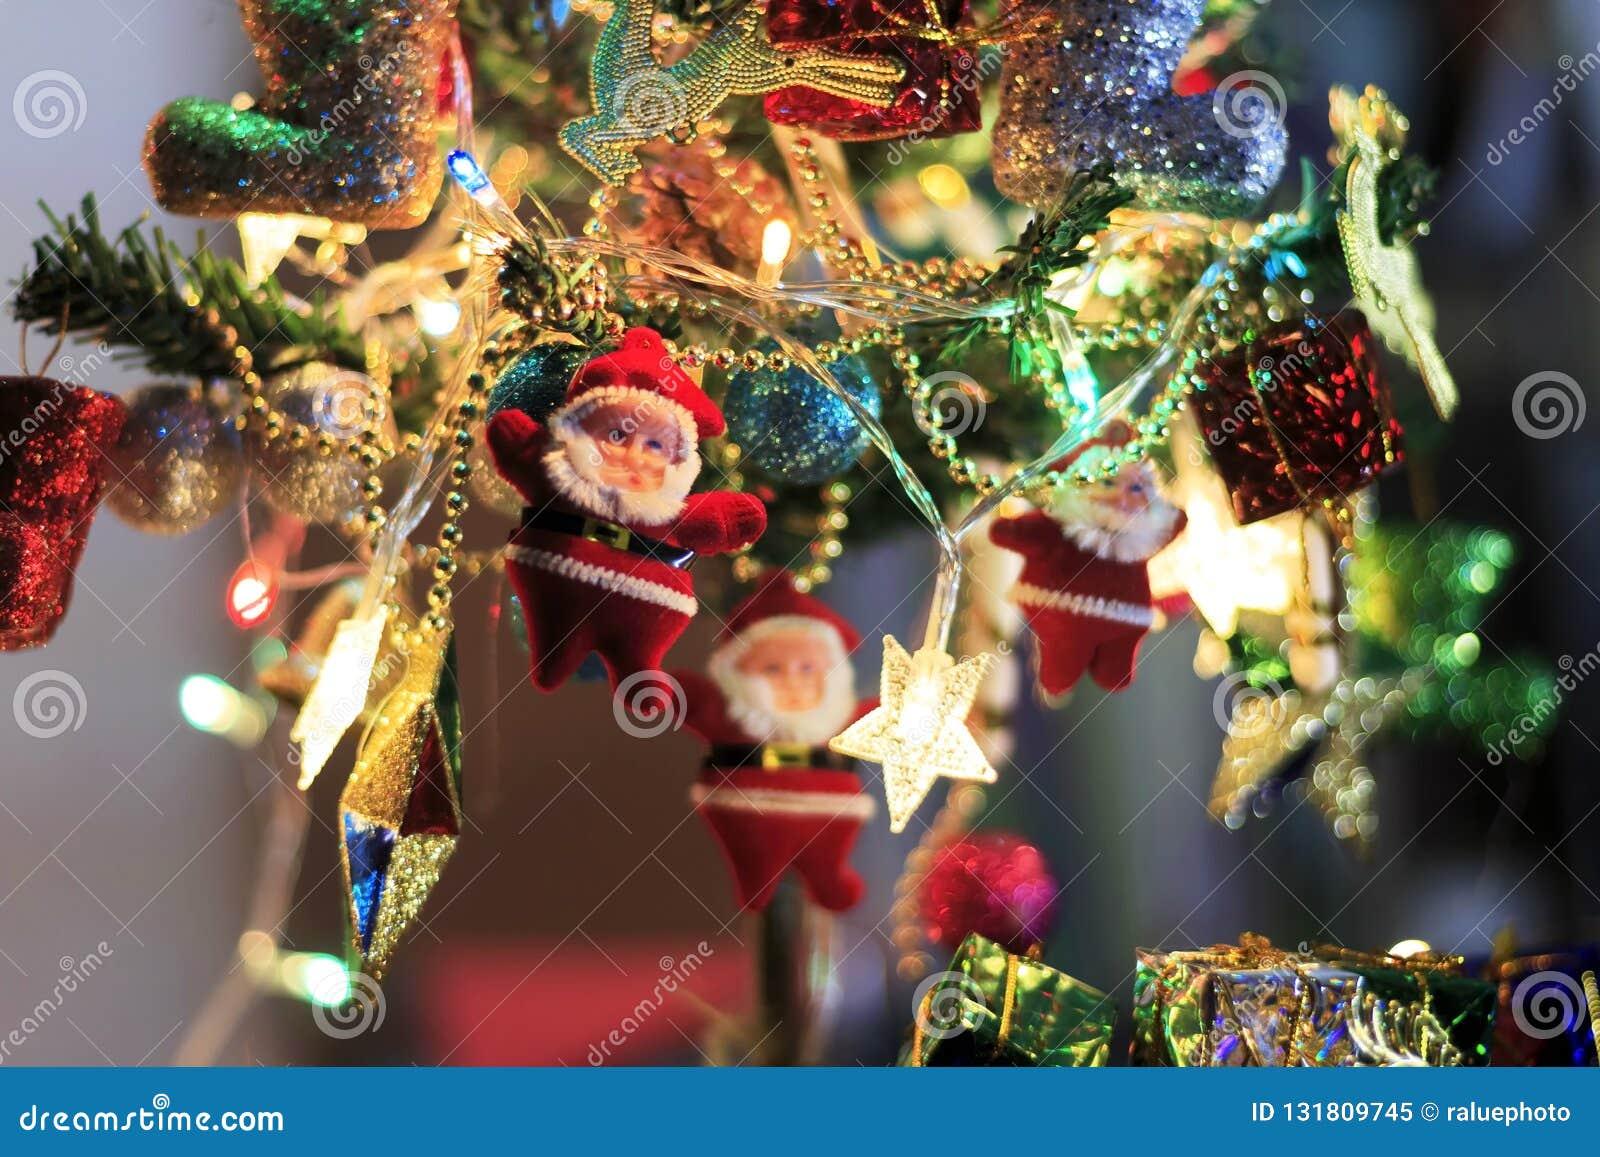 Christmas Tree With Decorative Lighting Stock Image Image Of Design Holiday 131809745